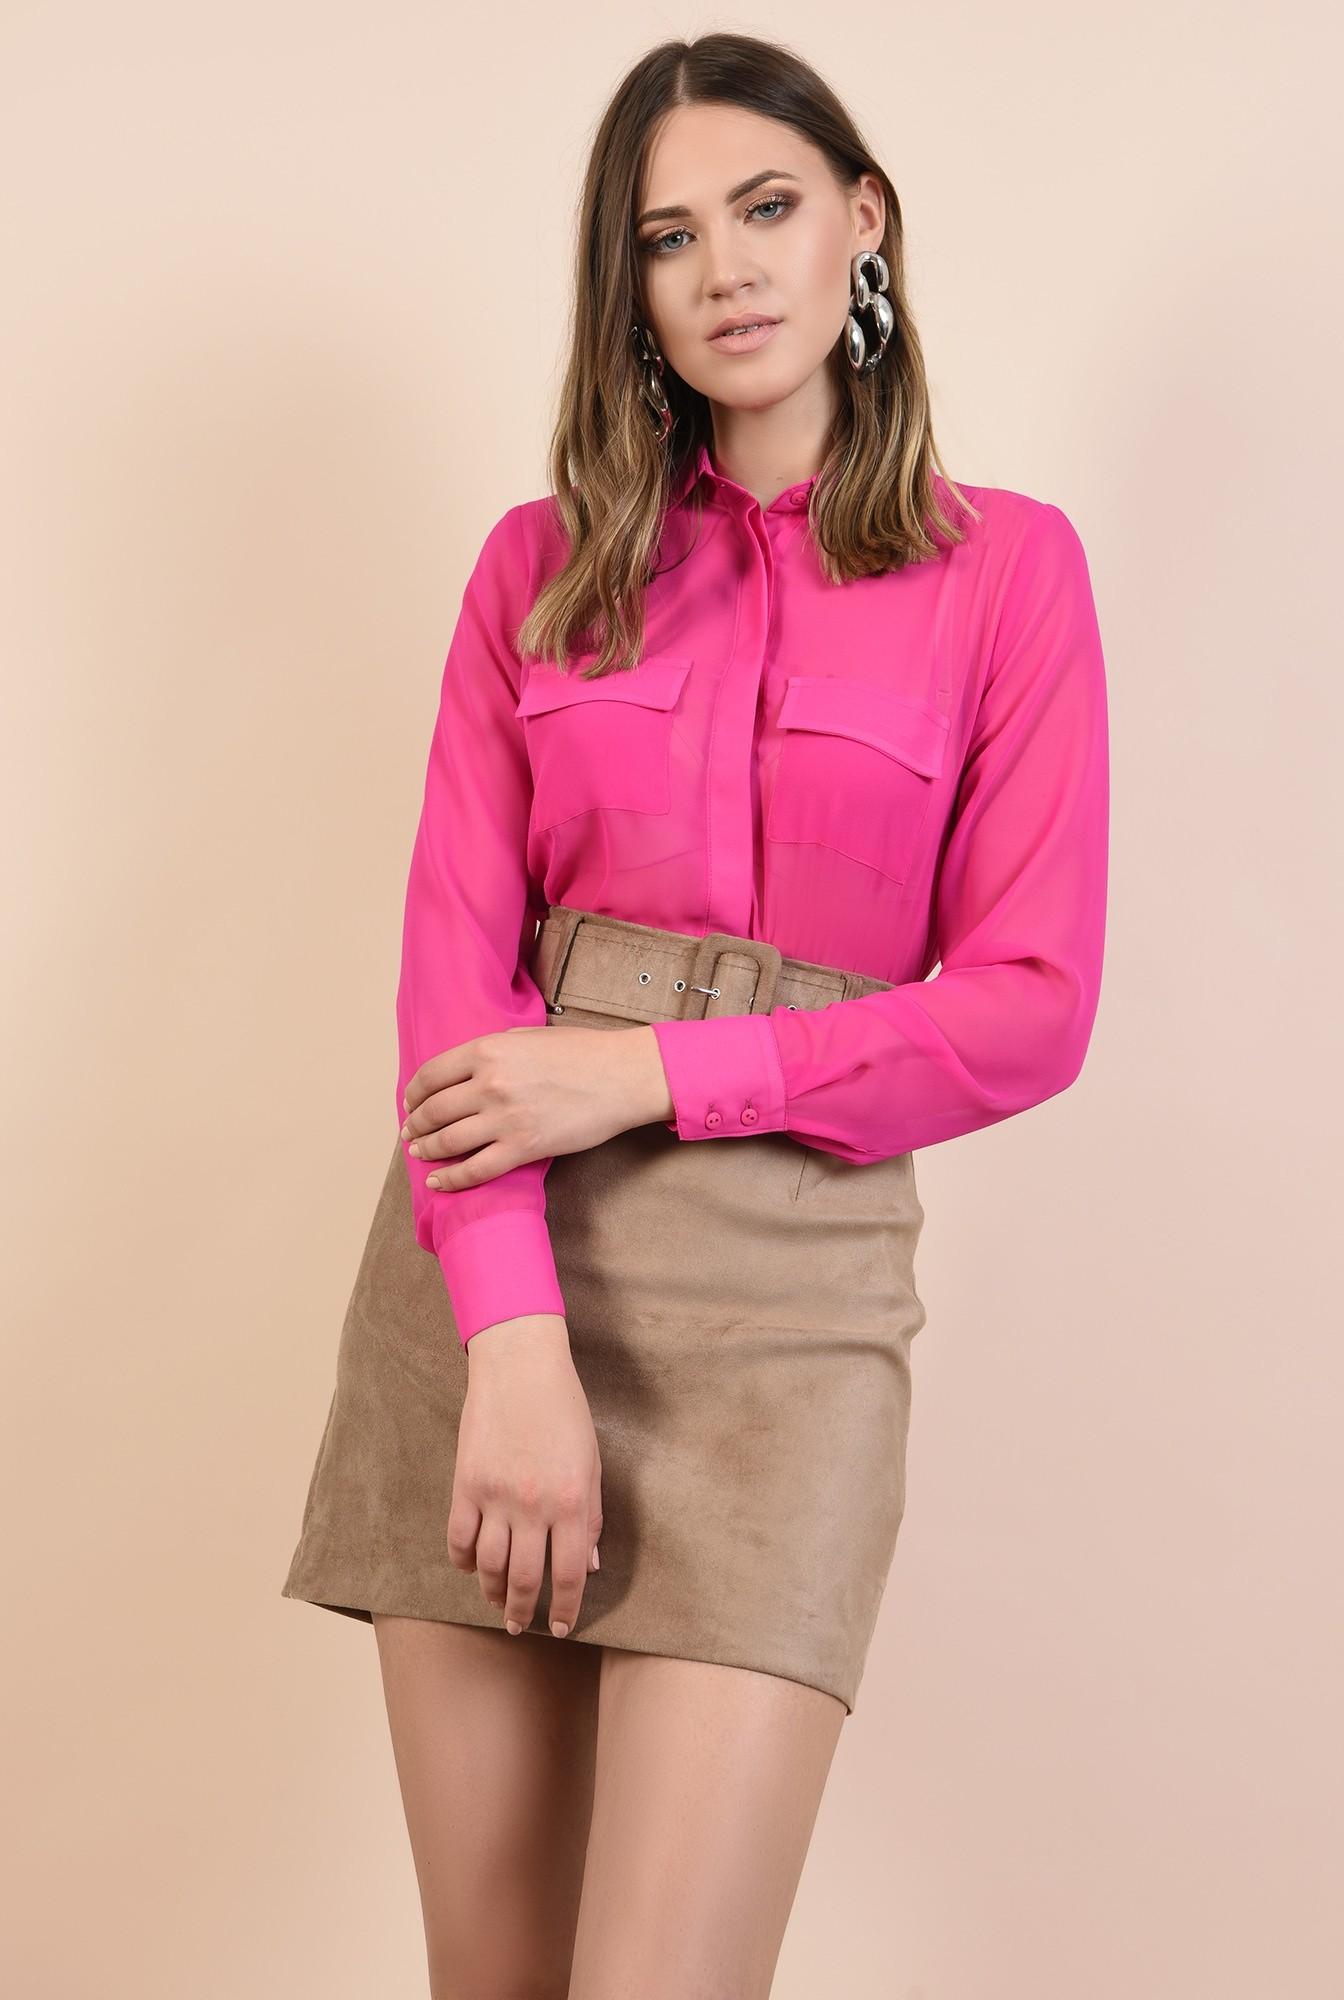 camasa roz, cu buzunare la piept, maneci lungi, guler ascutit, nasturi